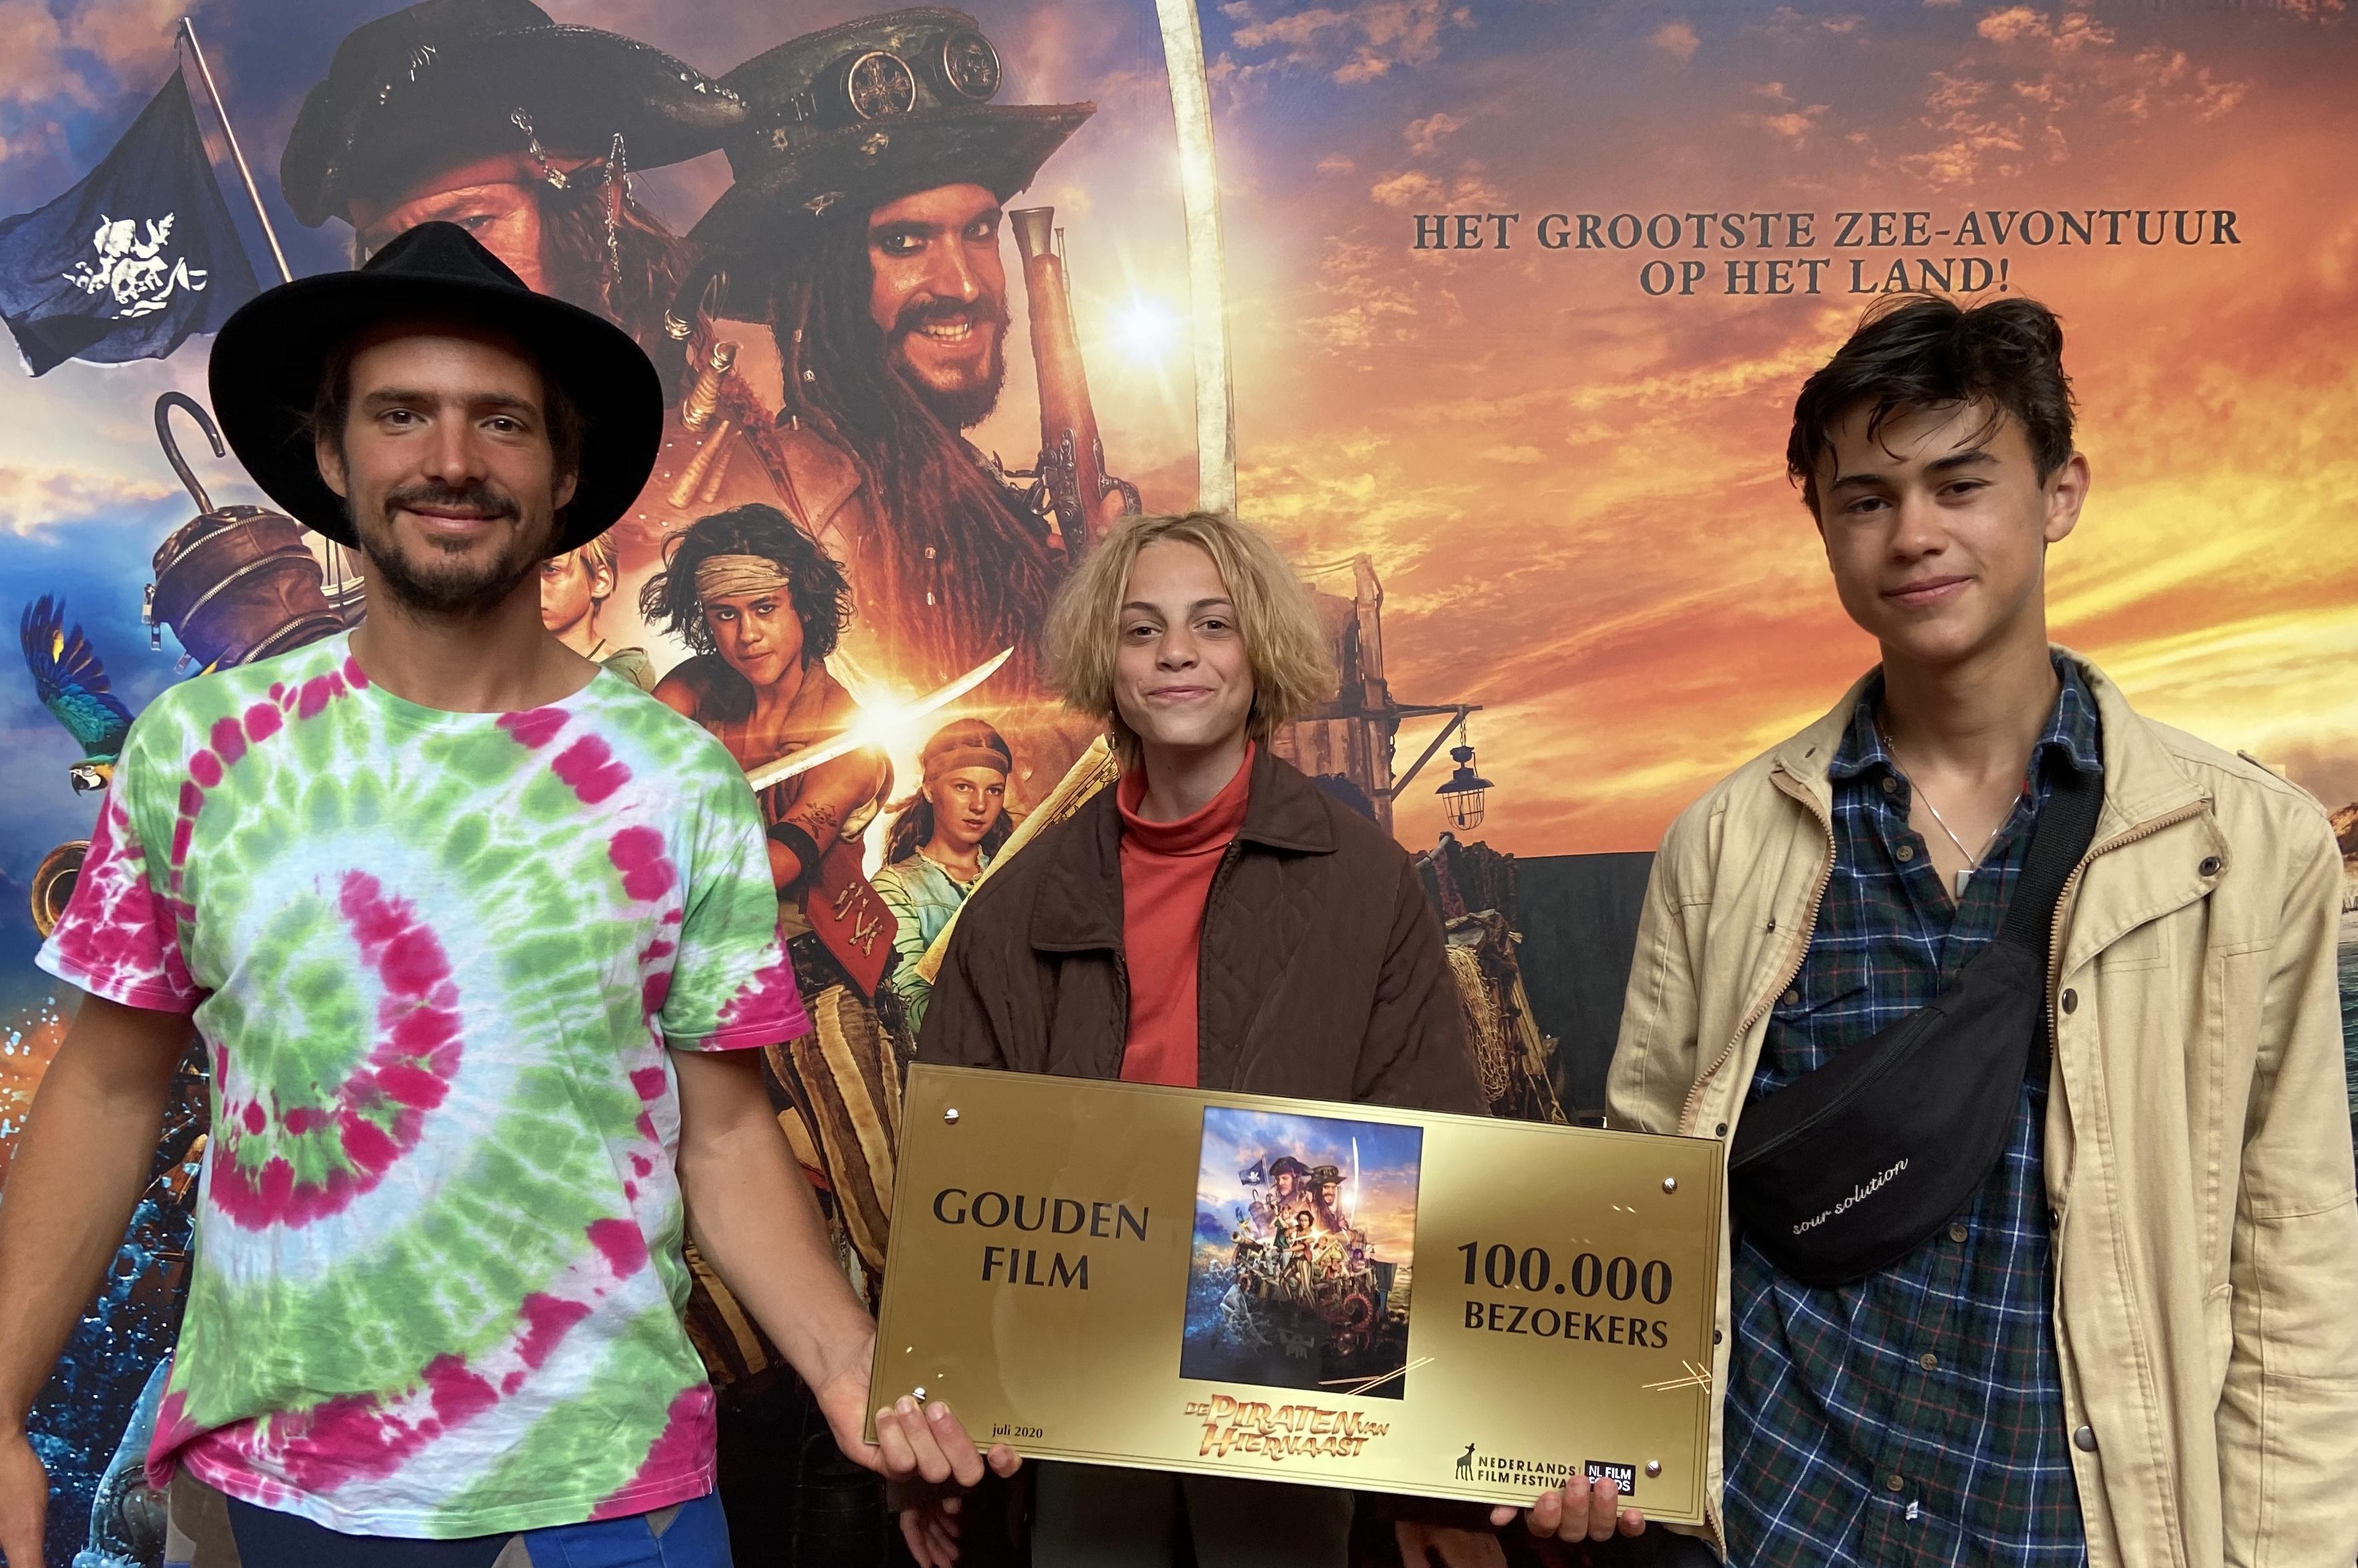 Gouden Film